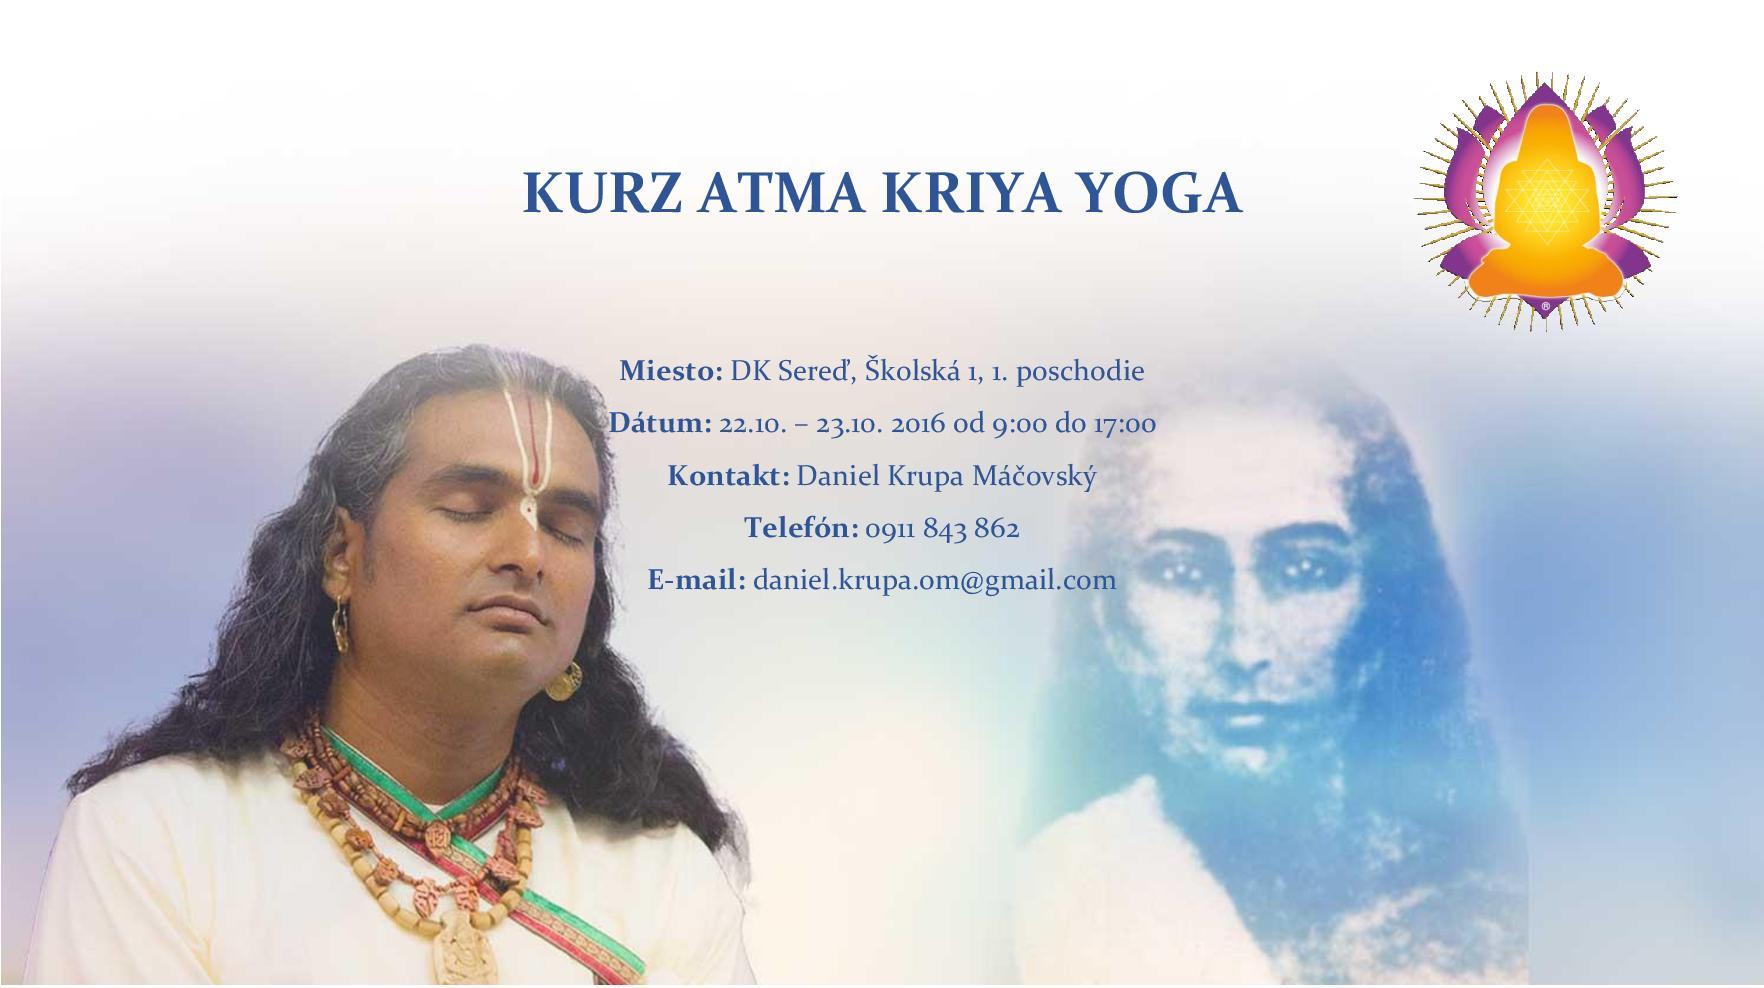 kurz-atma-kriya-yoga-page-0011